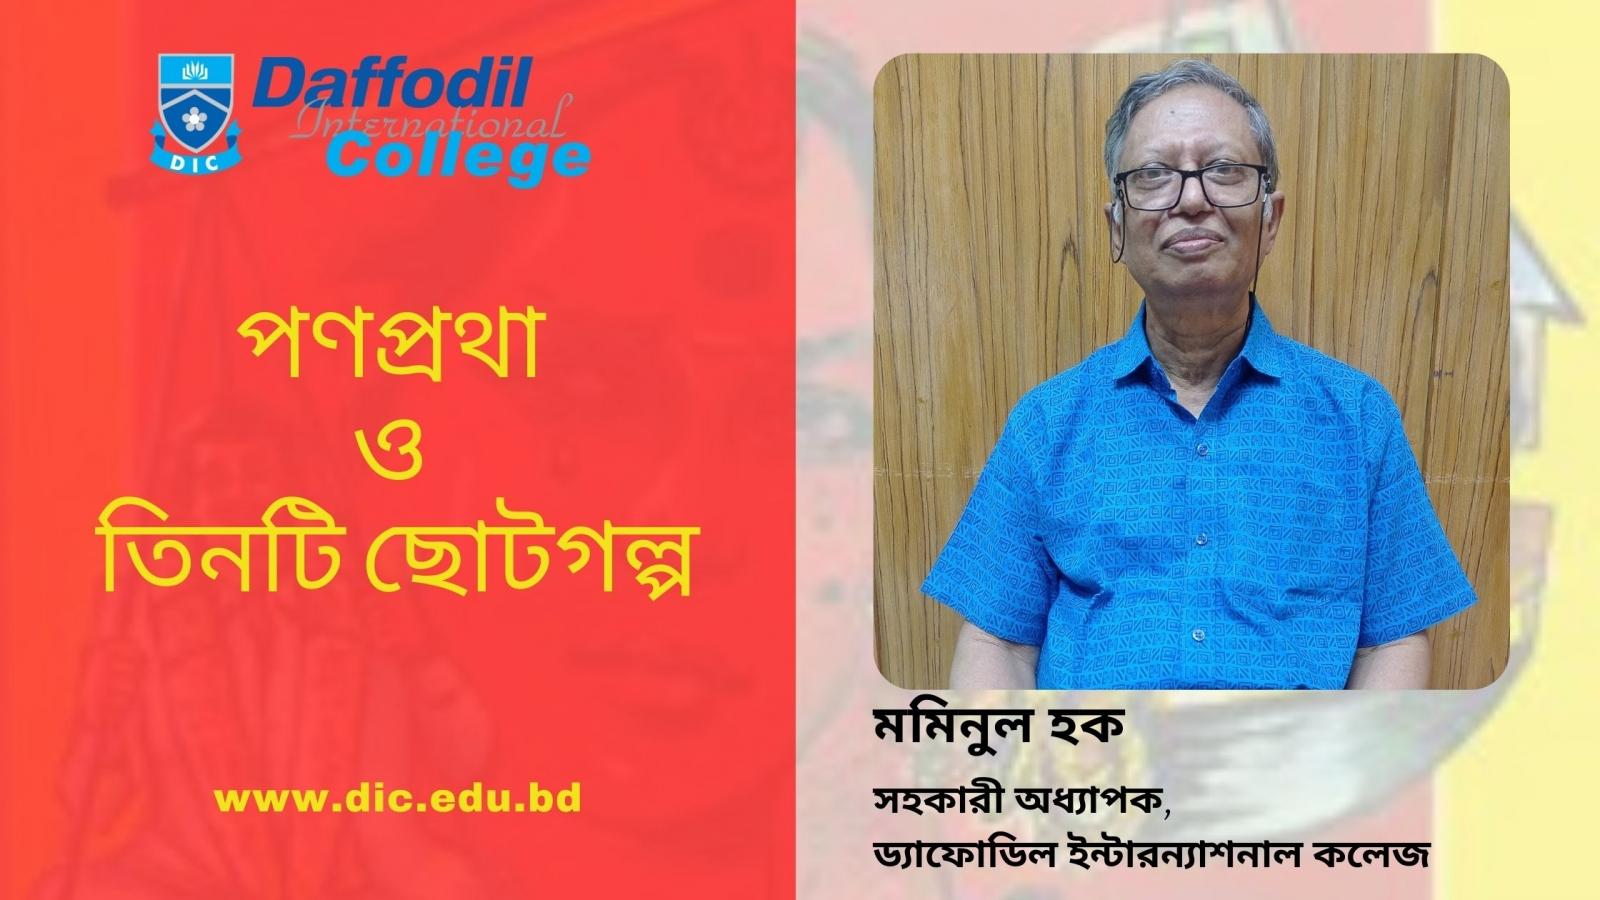 Mominul Huq (MH) Daffodil International College